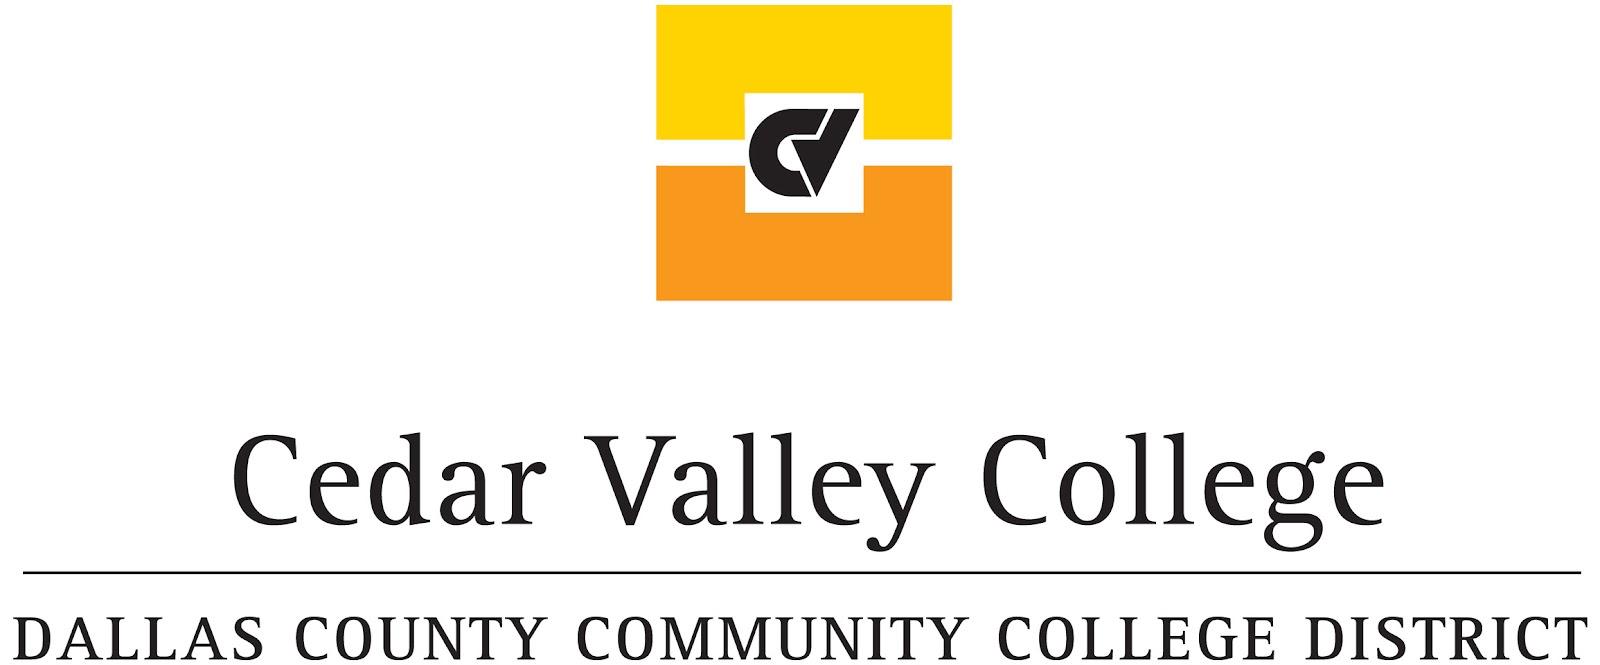 CVC_Logo06vertical_color.jpg